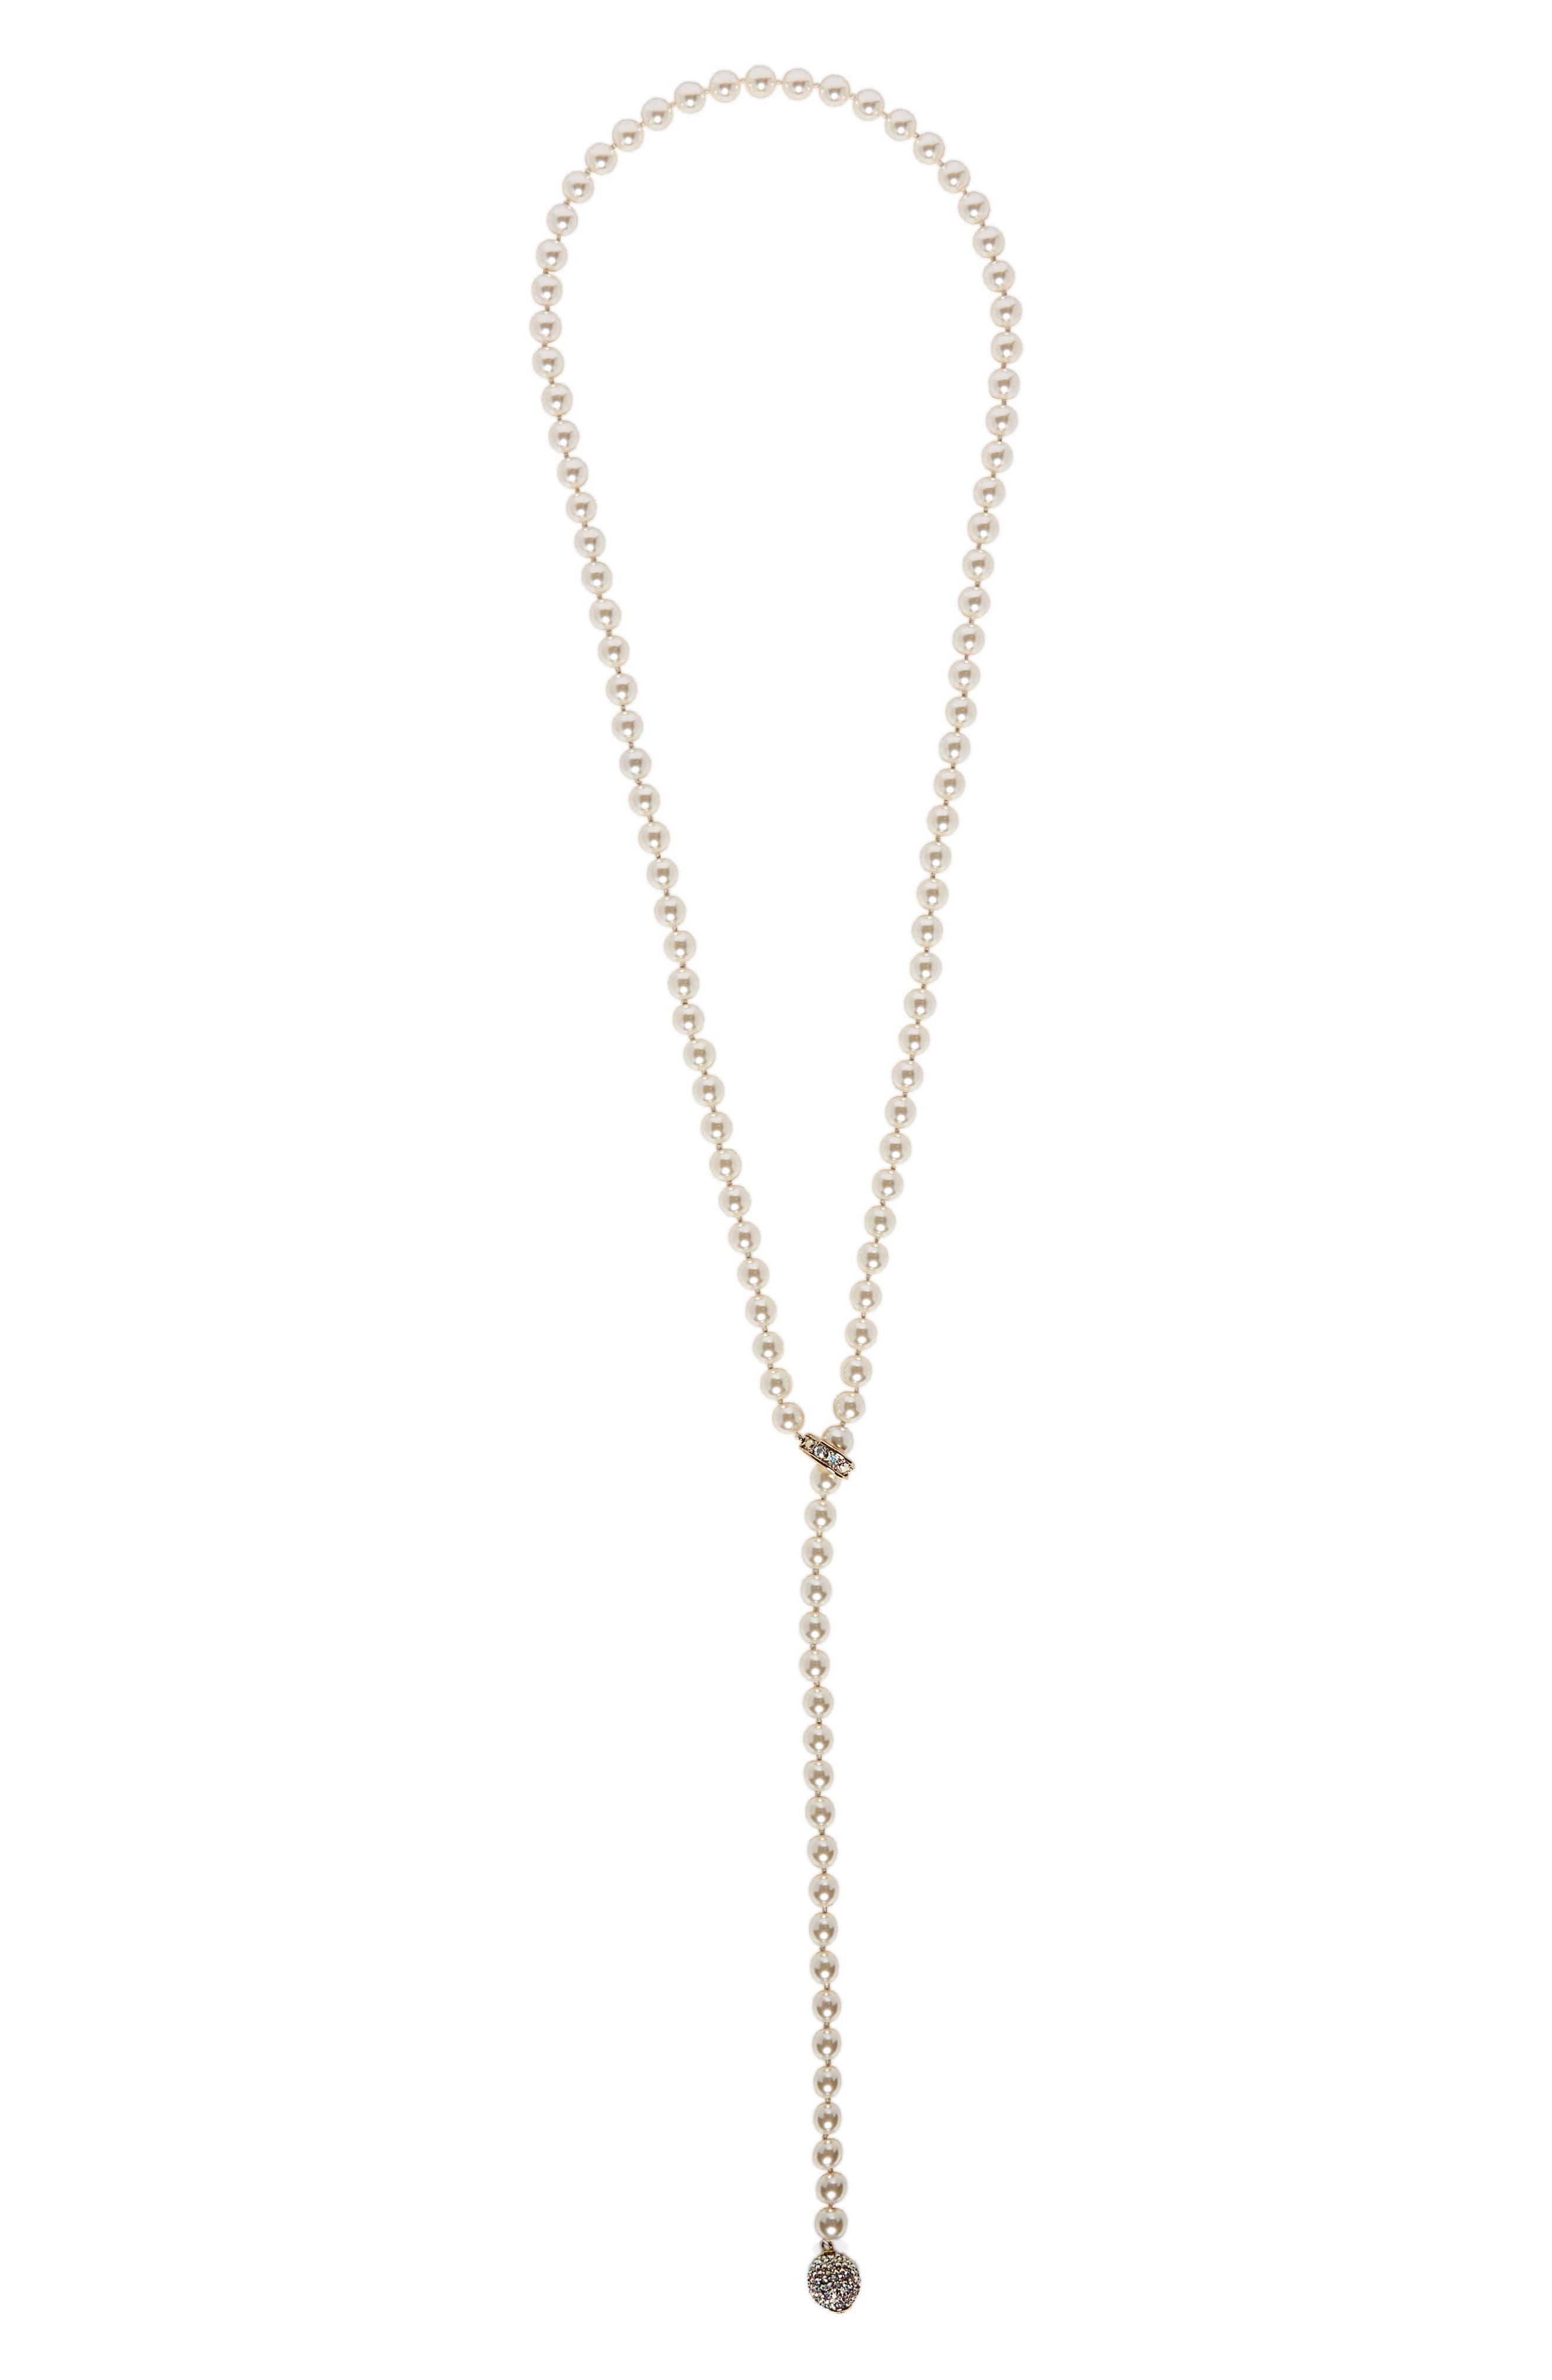 Swarovski Imitation Pearl & Crystal Lariat Necklace,                         Main,                         color, 710